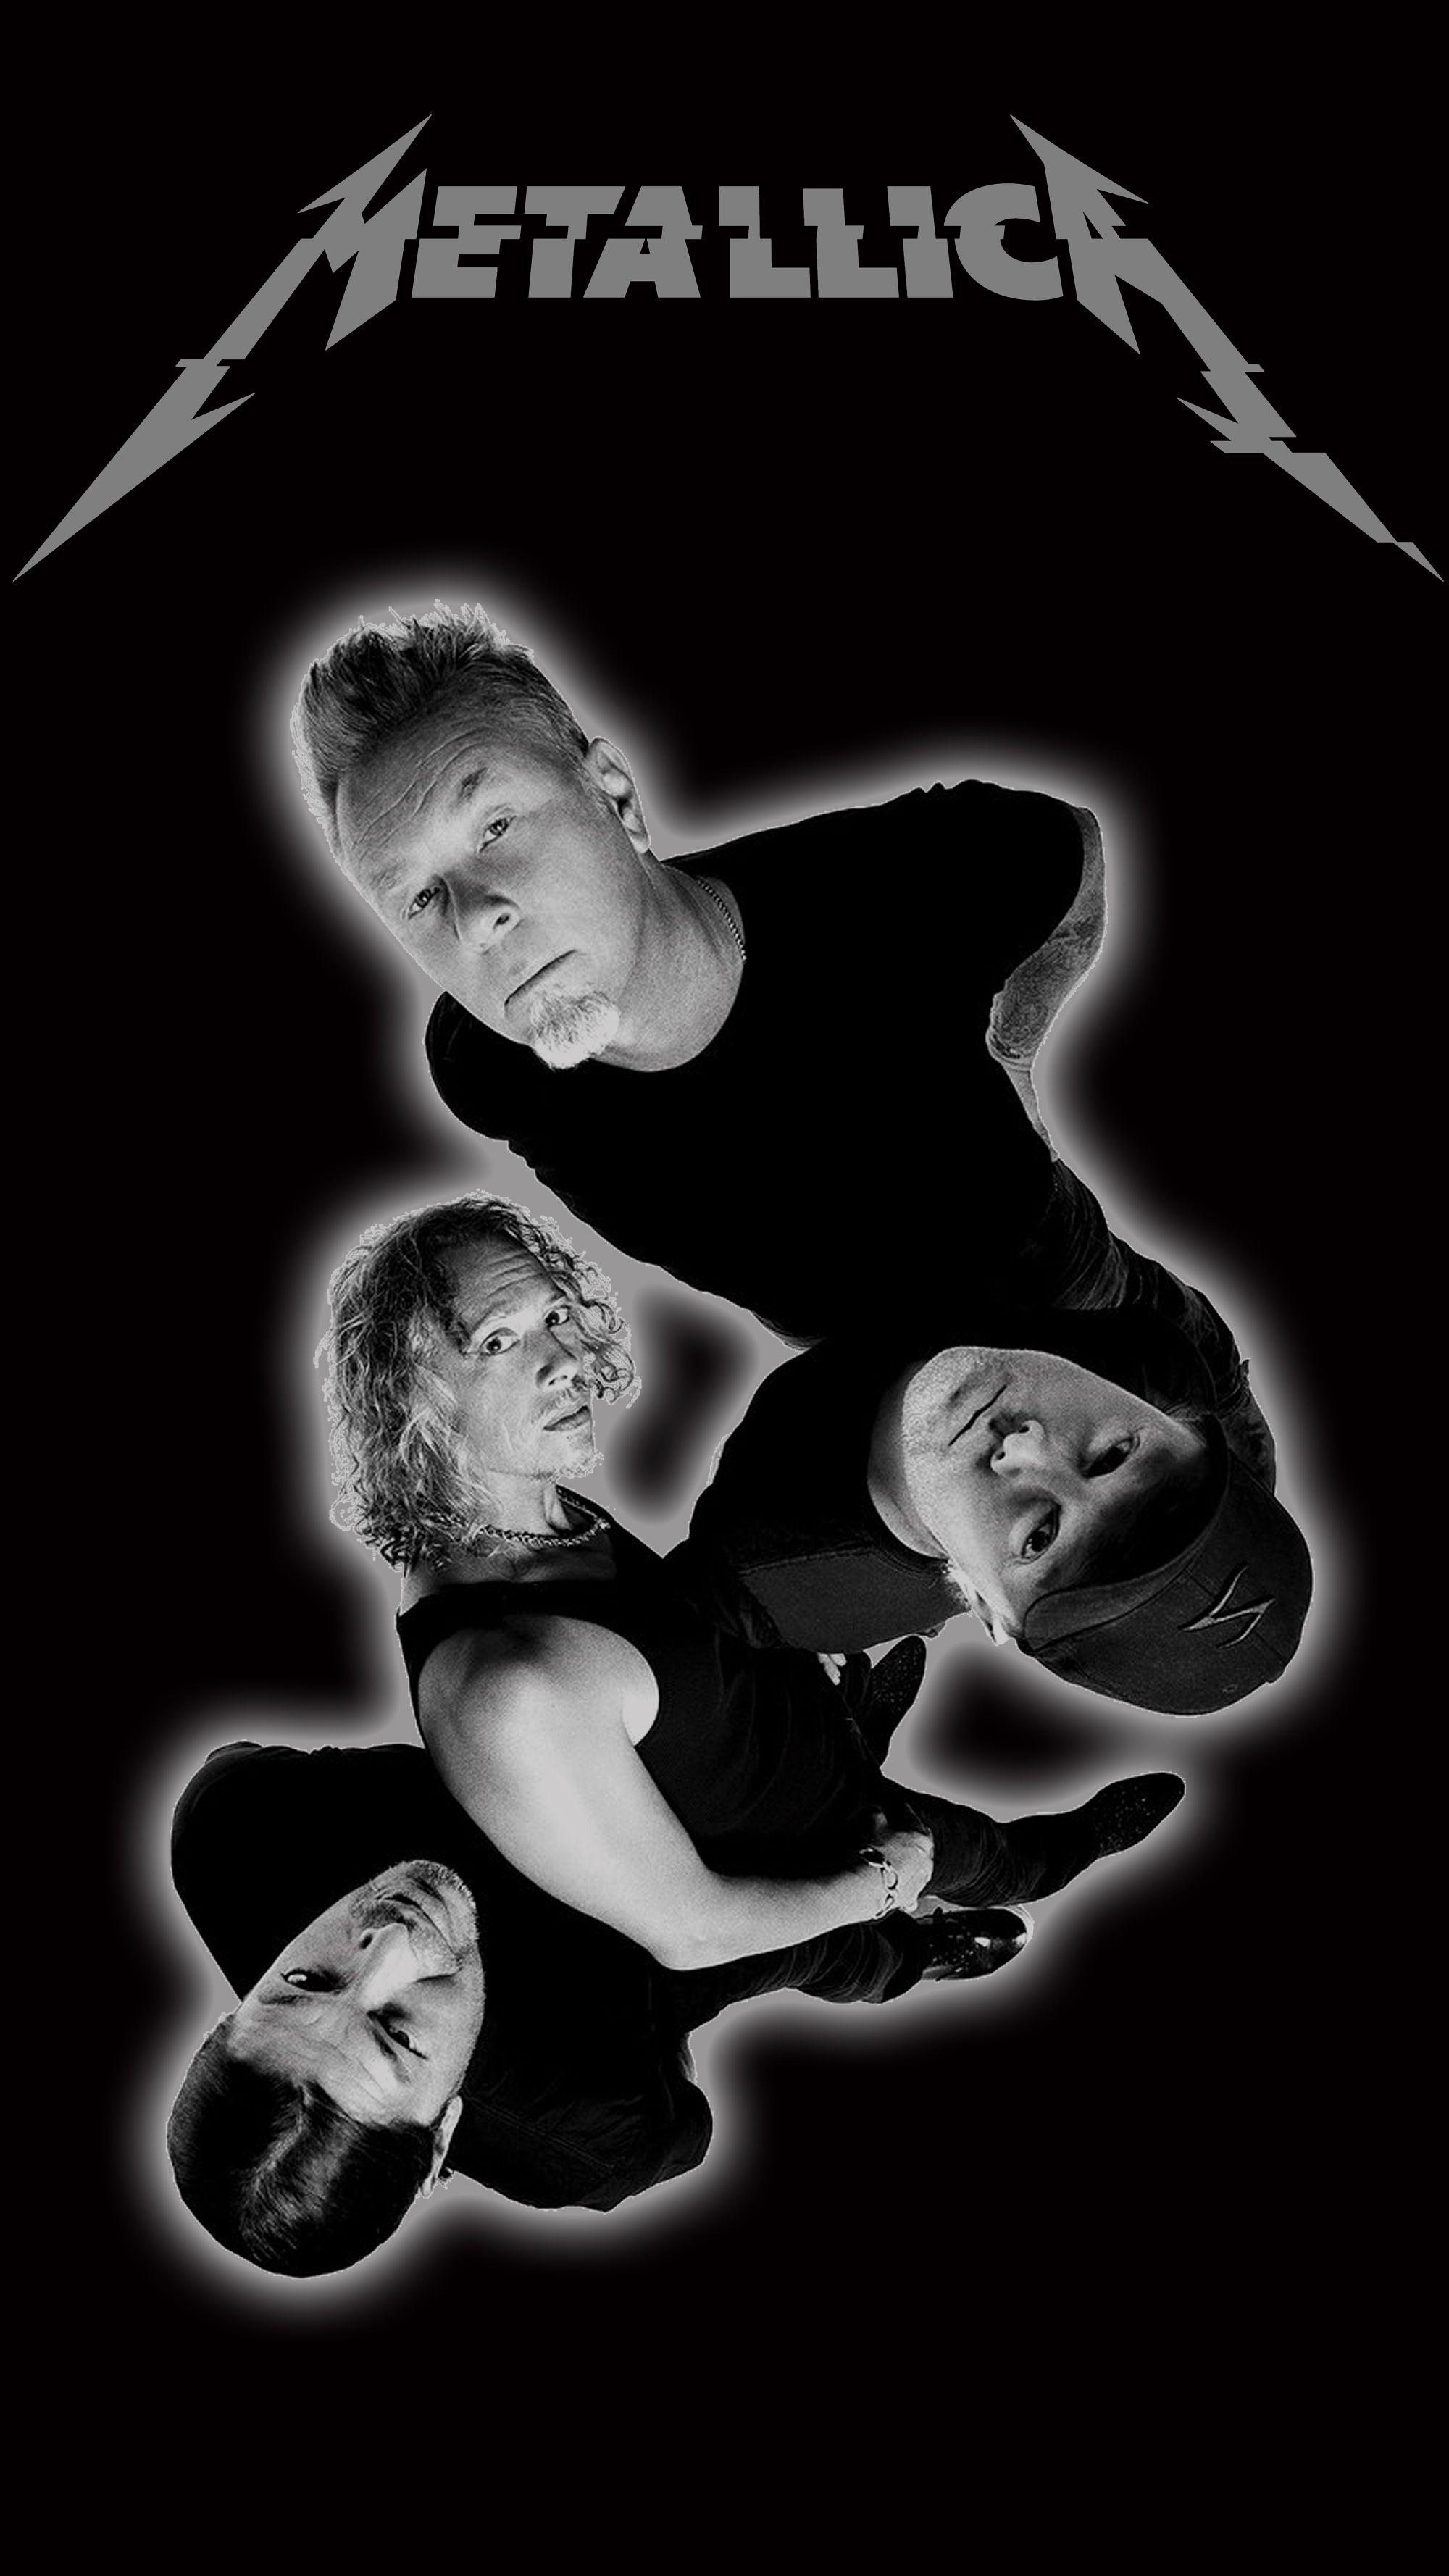 For Wallpaper Smartphone 5 Metallica Hardwired Metallica Logo Metallica Black Album Metallica Black